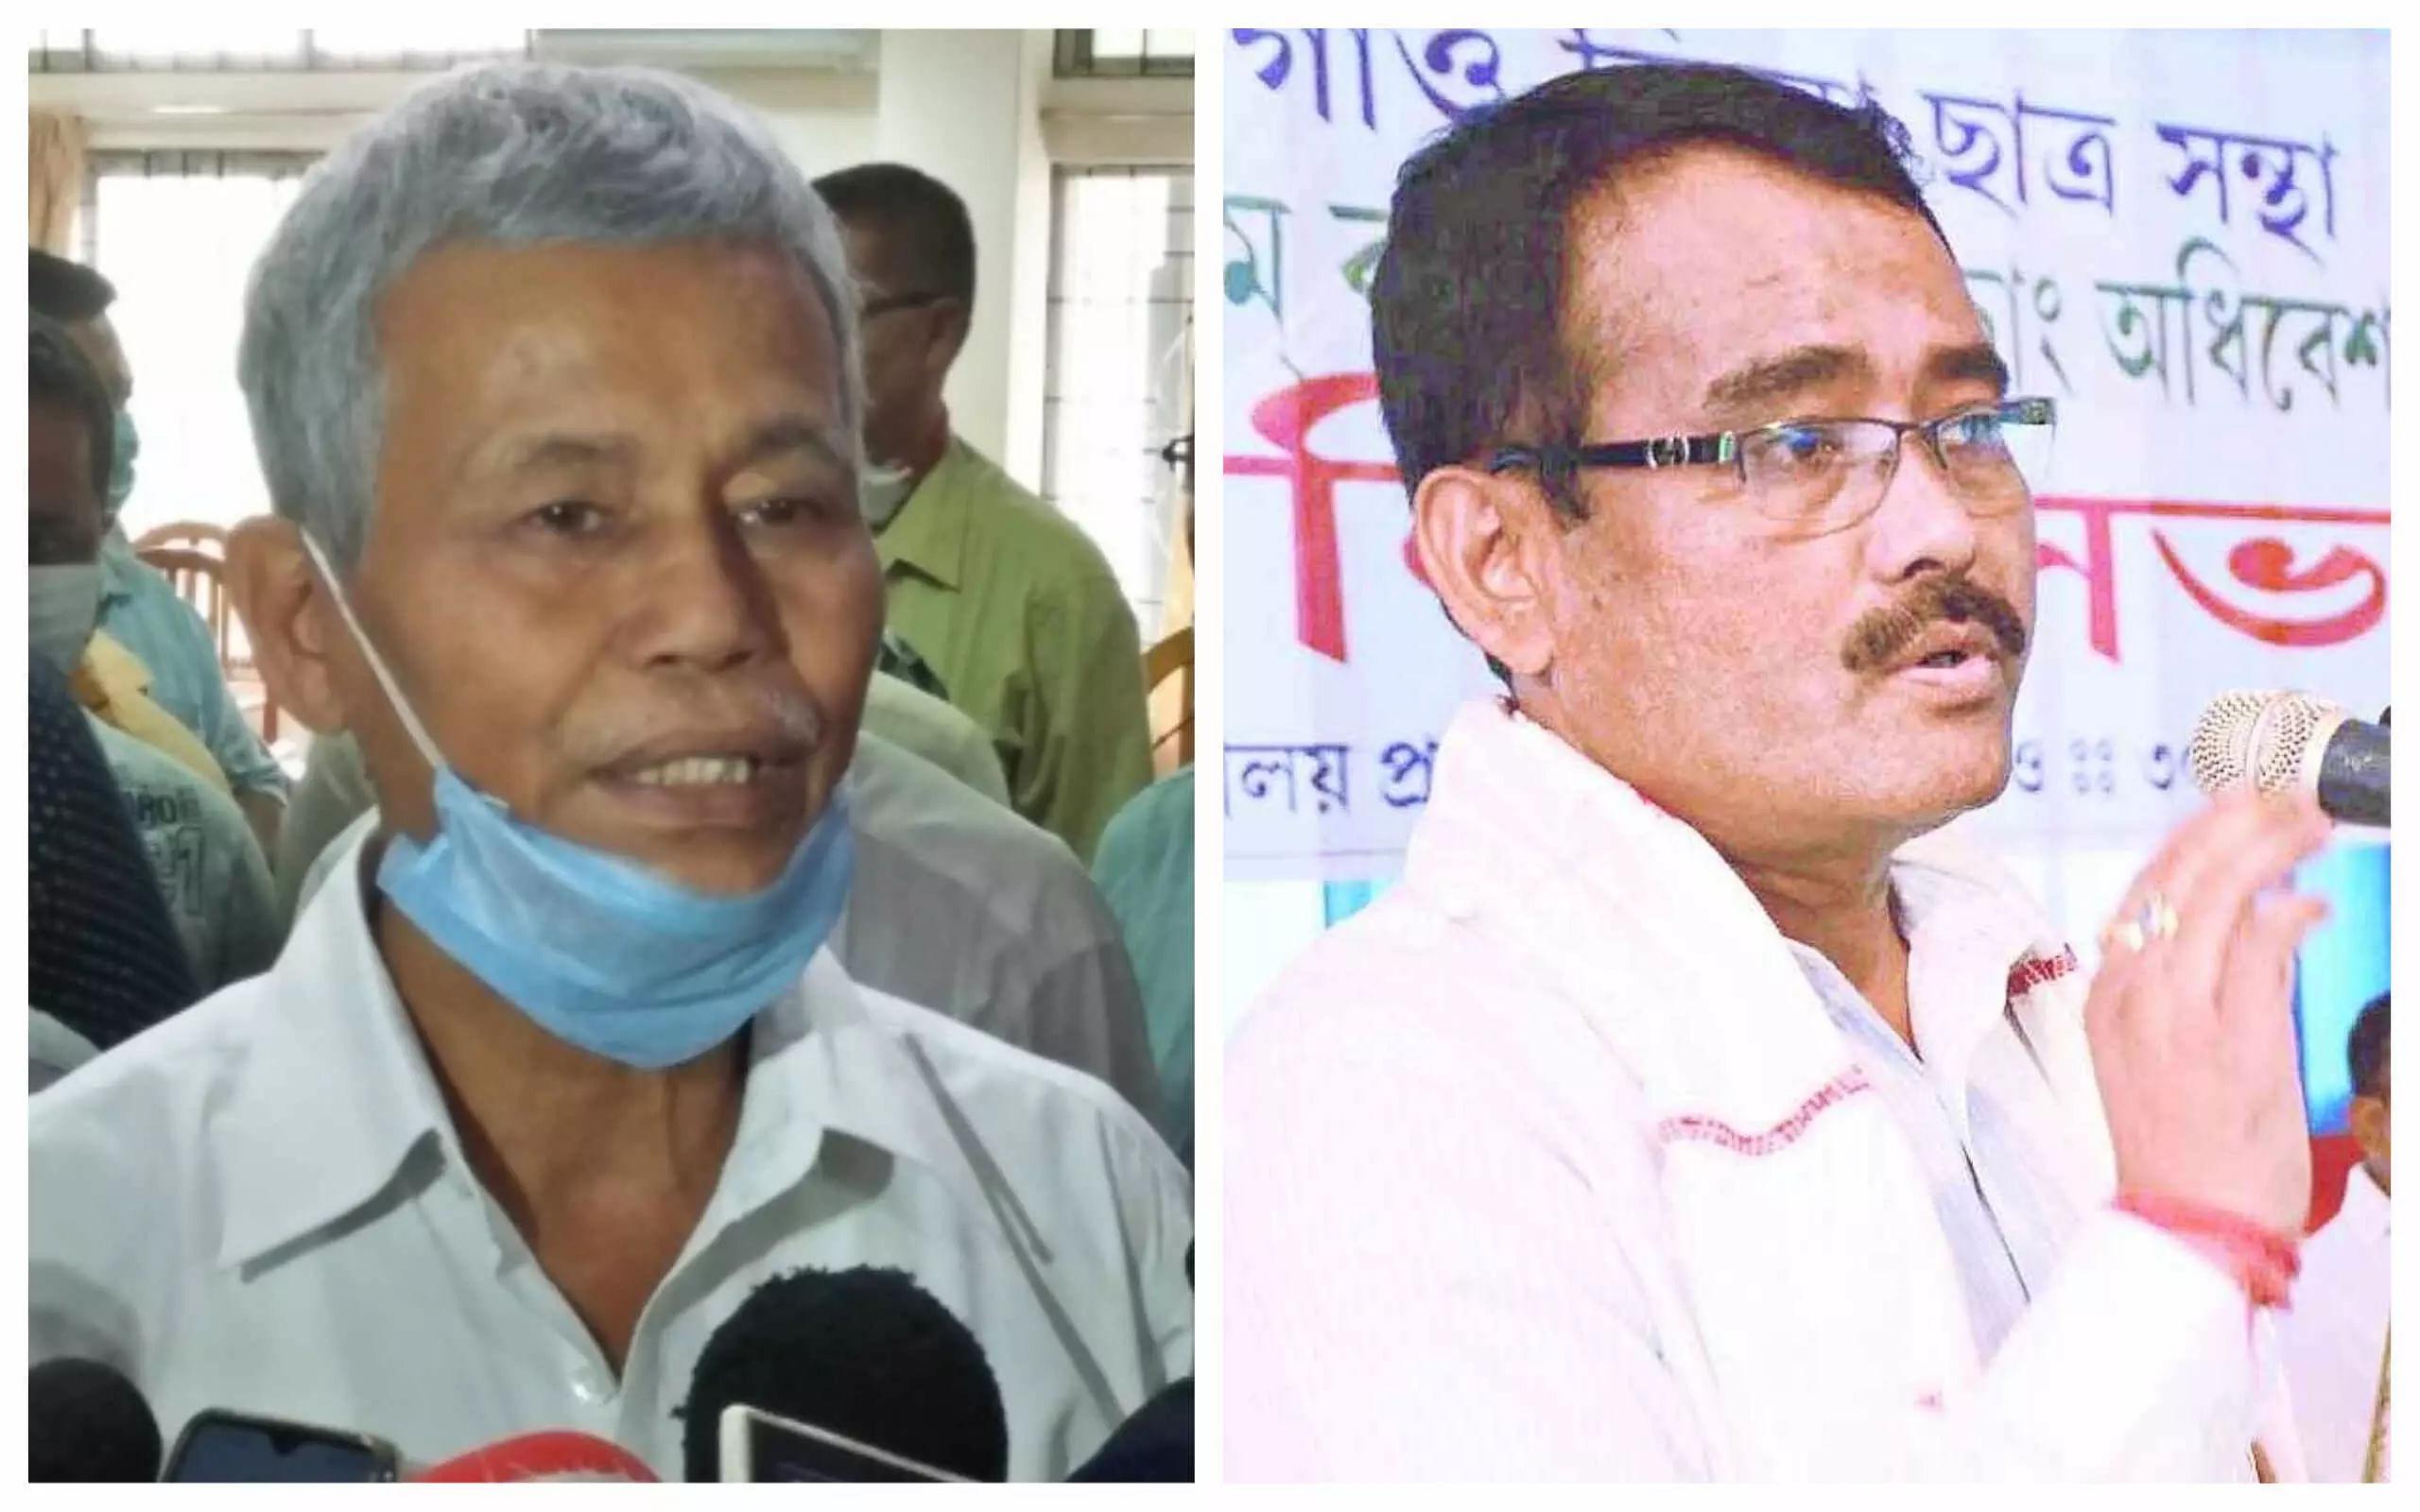 Phani Bhushan Choudhury